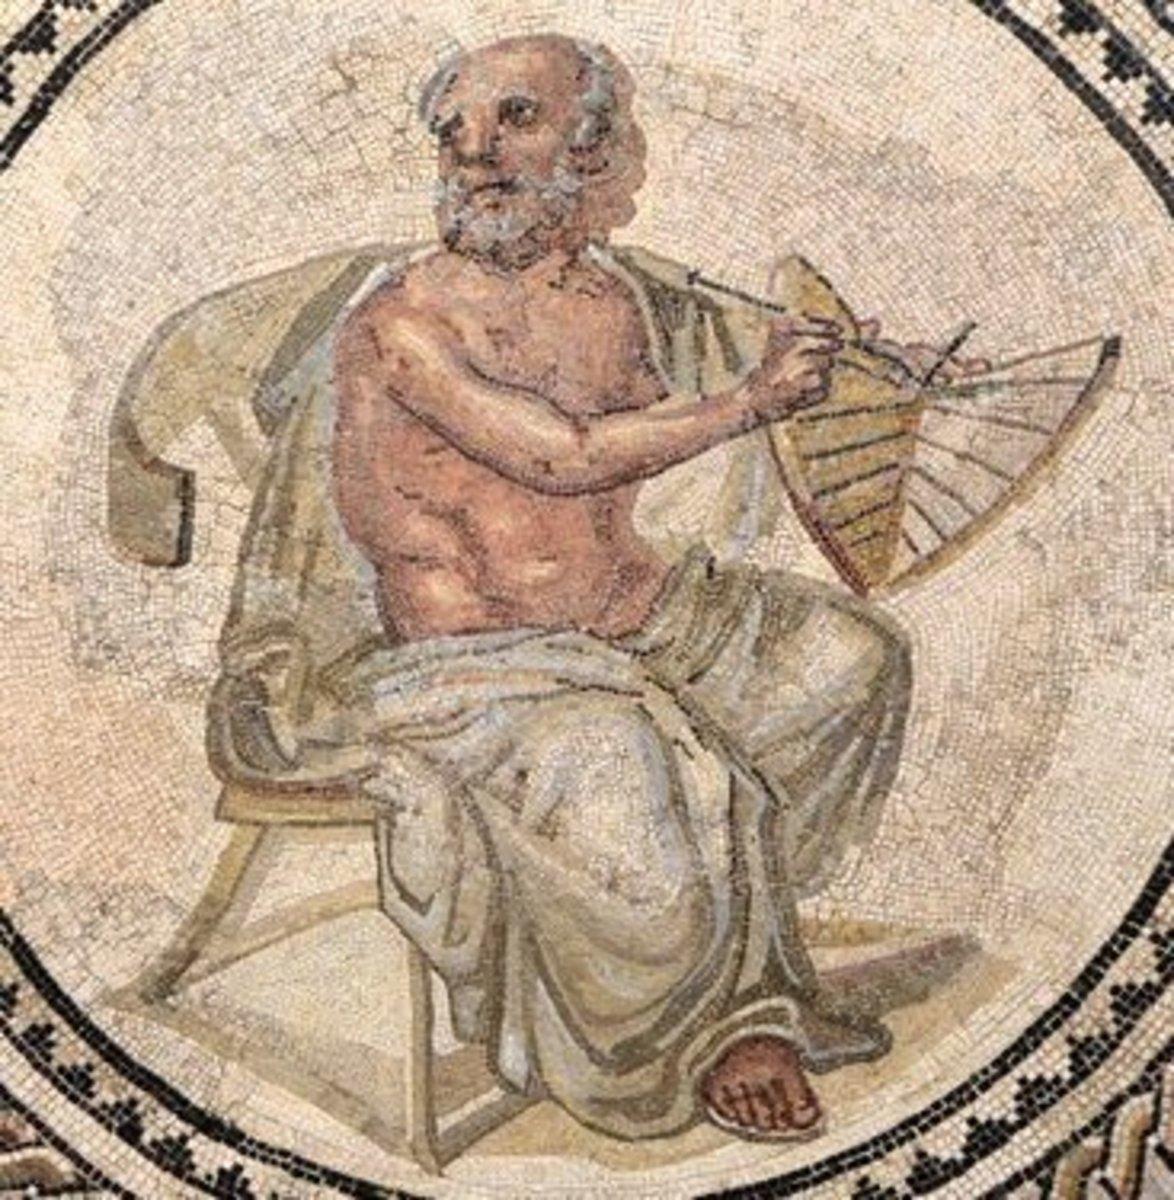 The Ancient Greek Philosopher Anaximander of Miletus